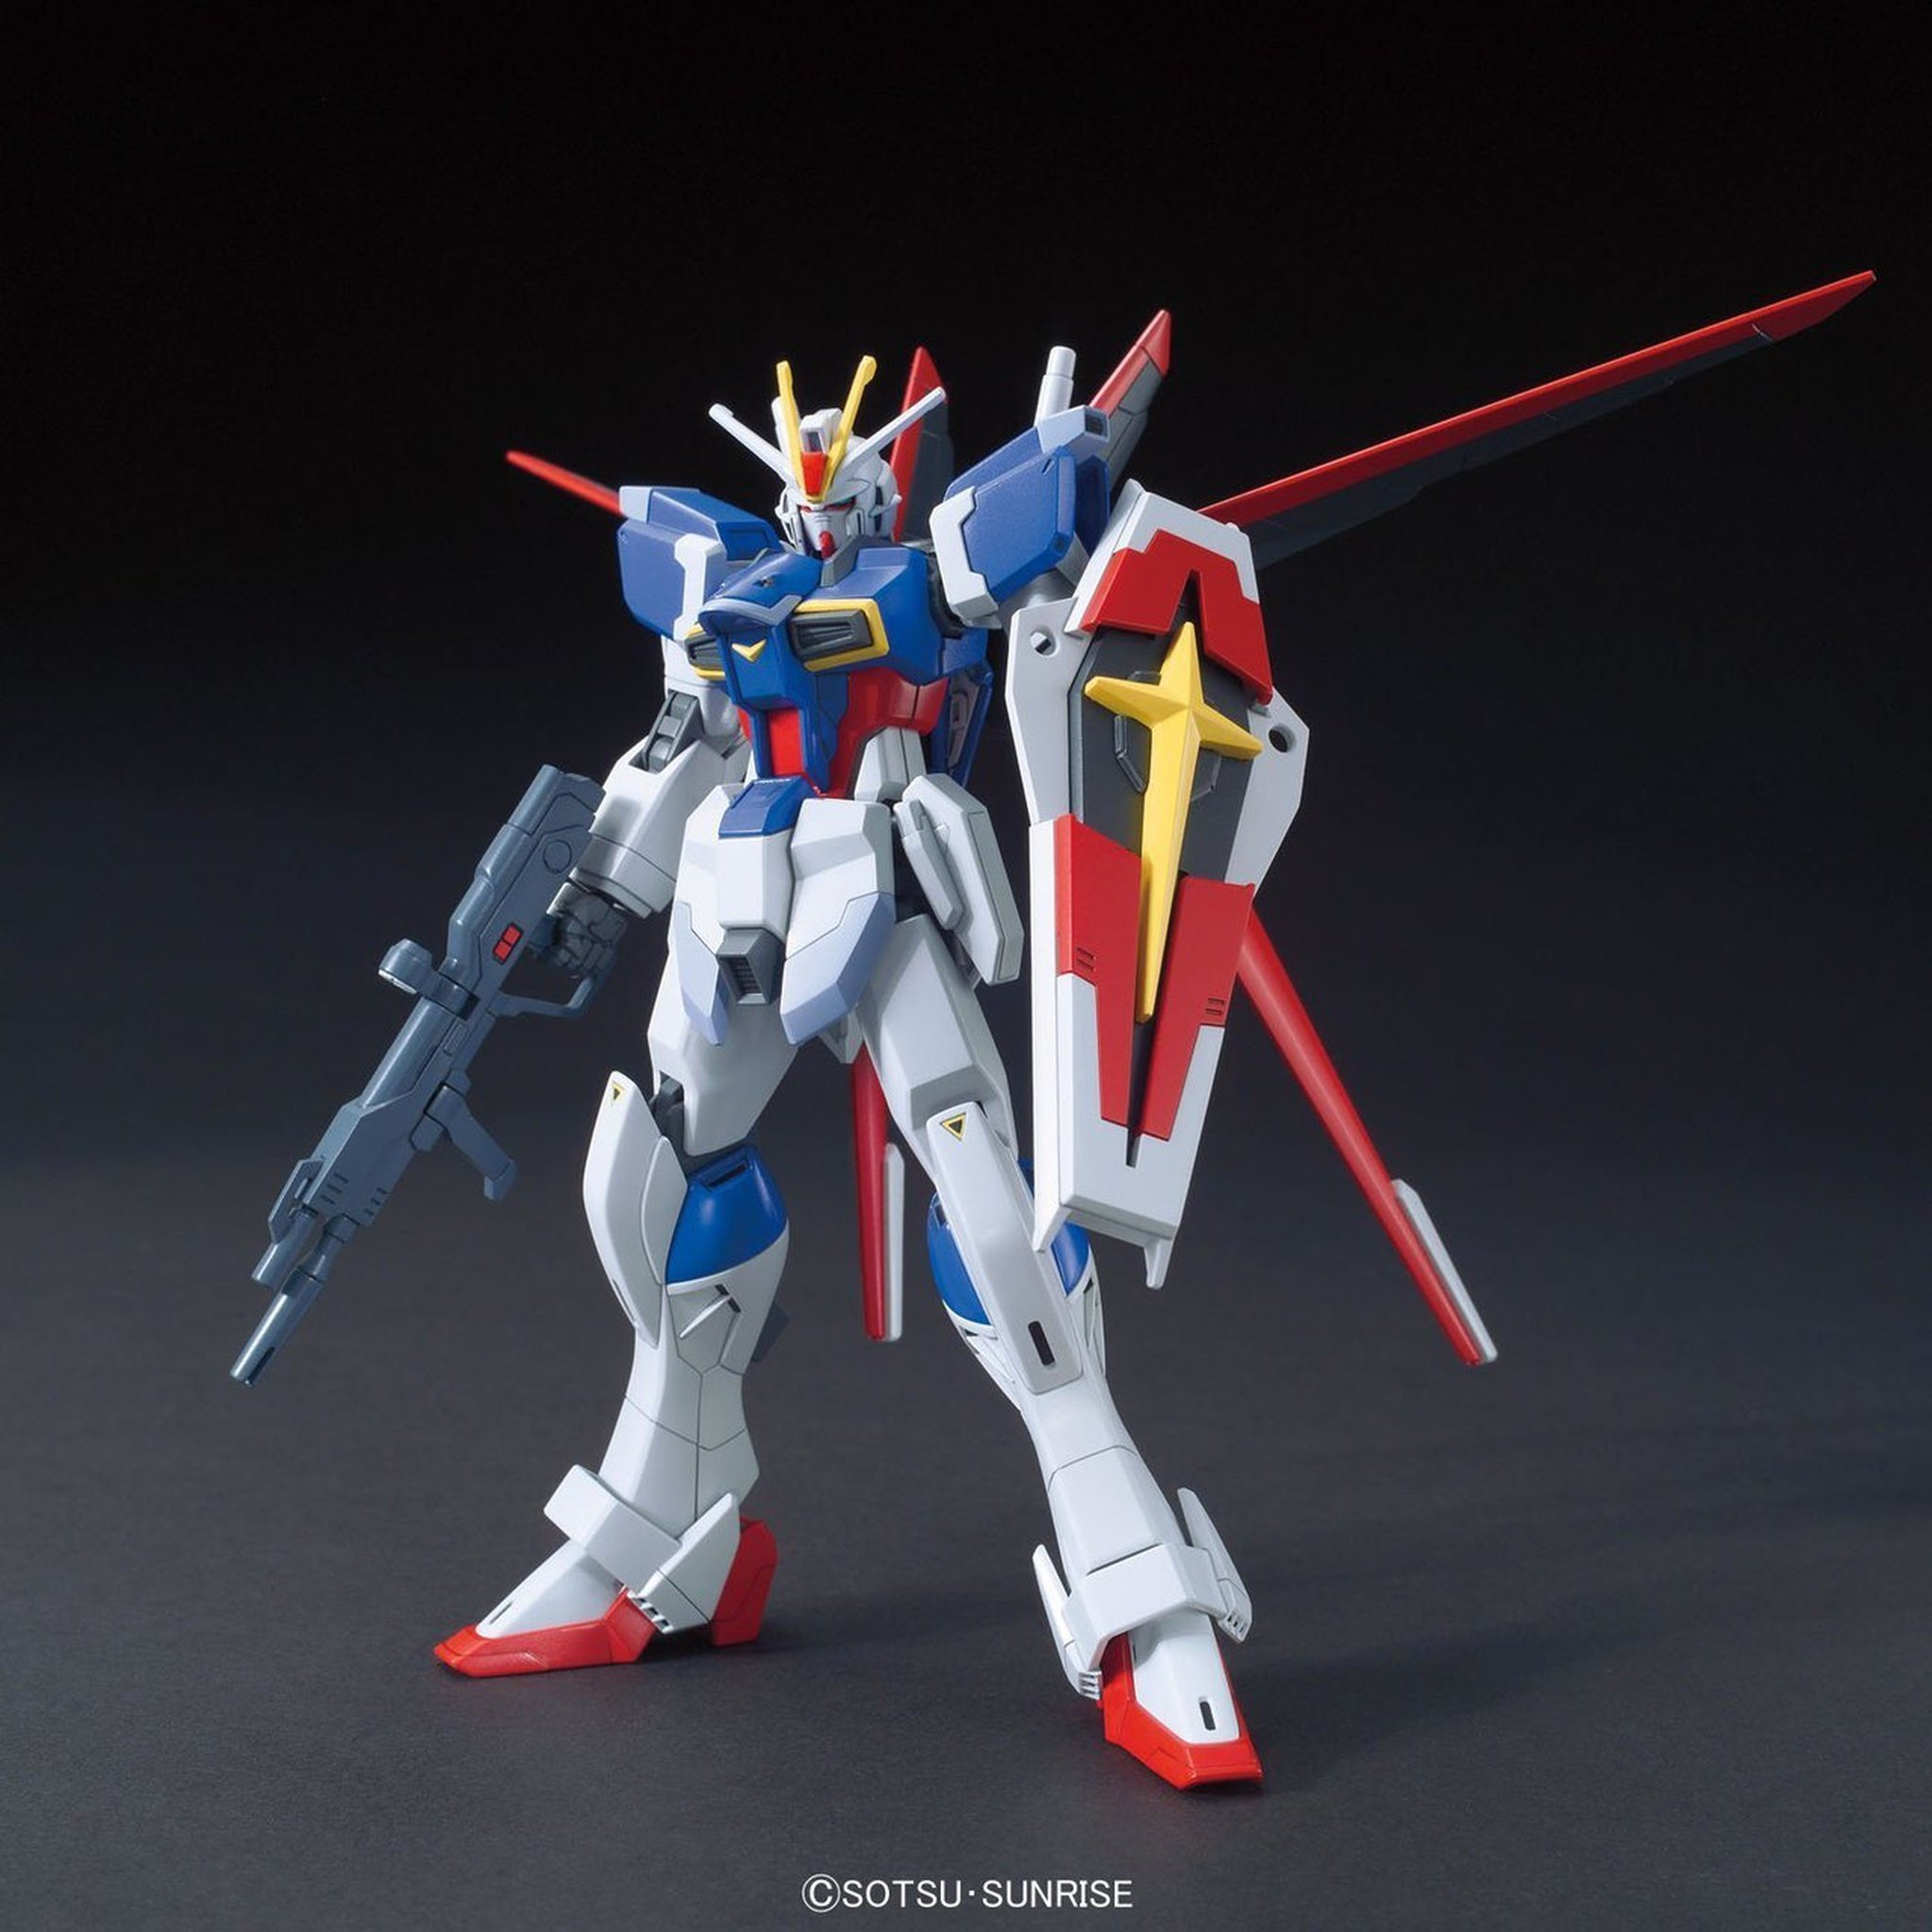 "Bandai/Gundam Wing #198 Zgmf-X56s/A Force Impulse Gundam Hgce Model Kit, From \""Gund"